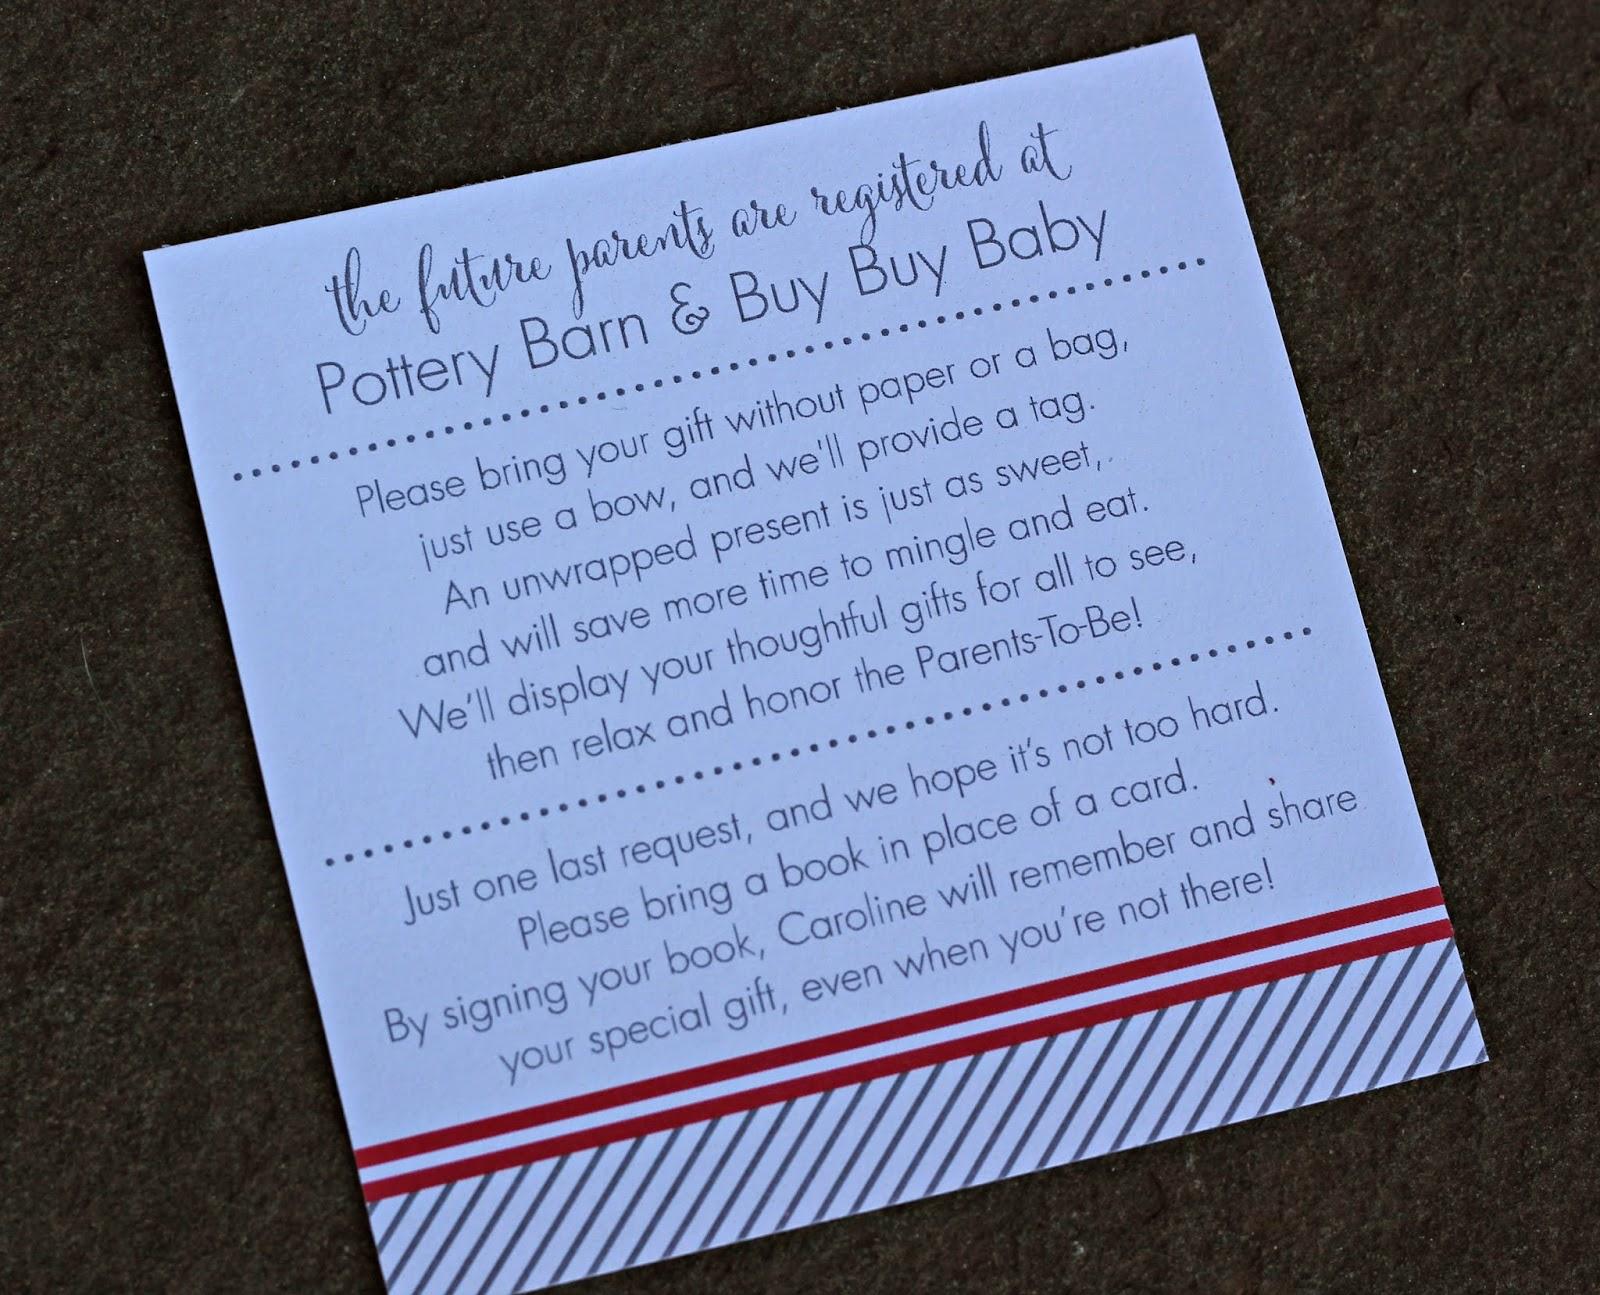 Gift Card Wedding Shower Invitation Wording: Five On Friday!